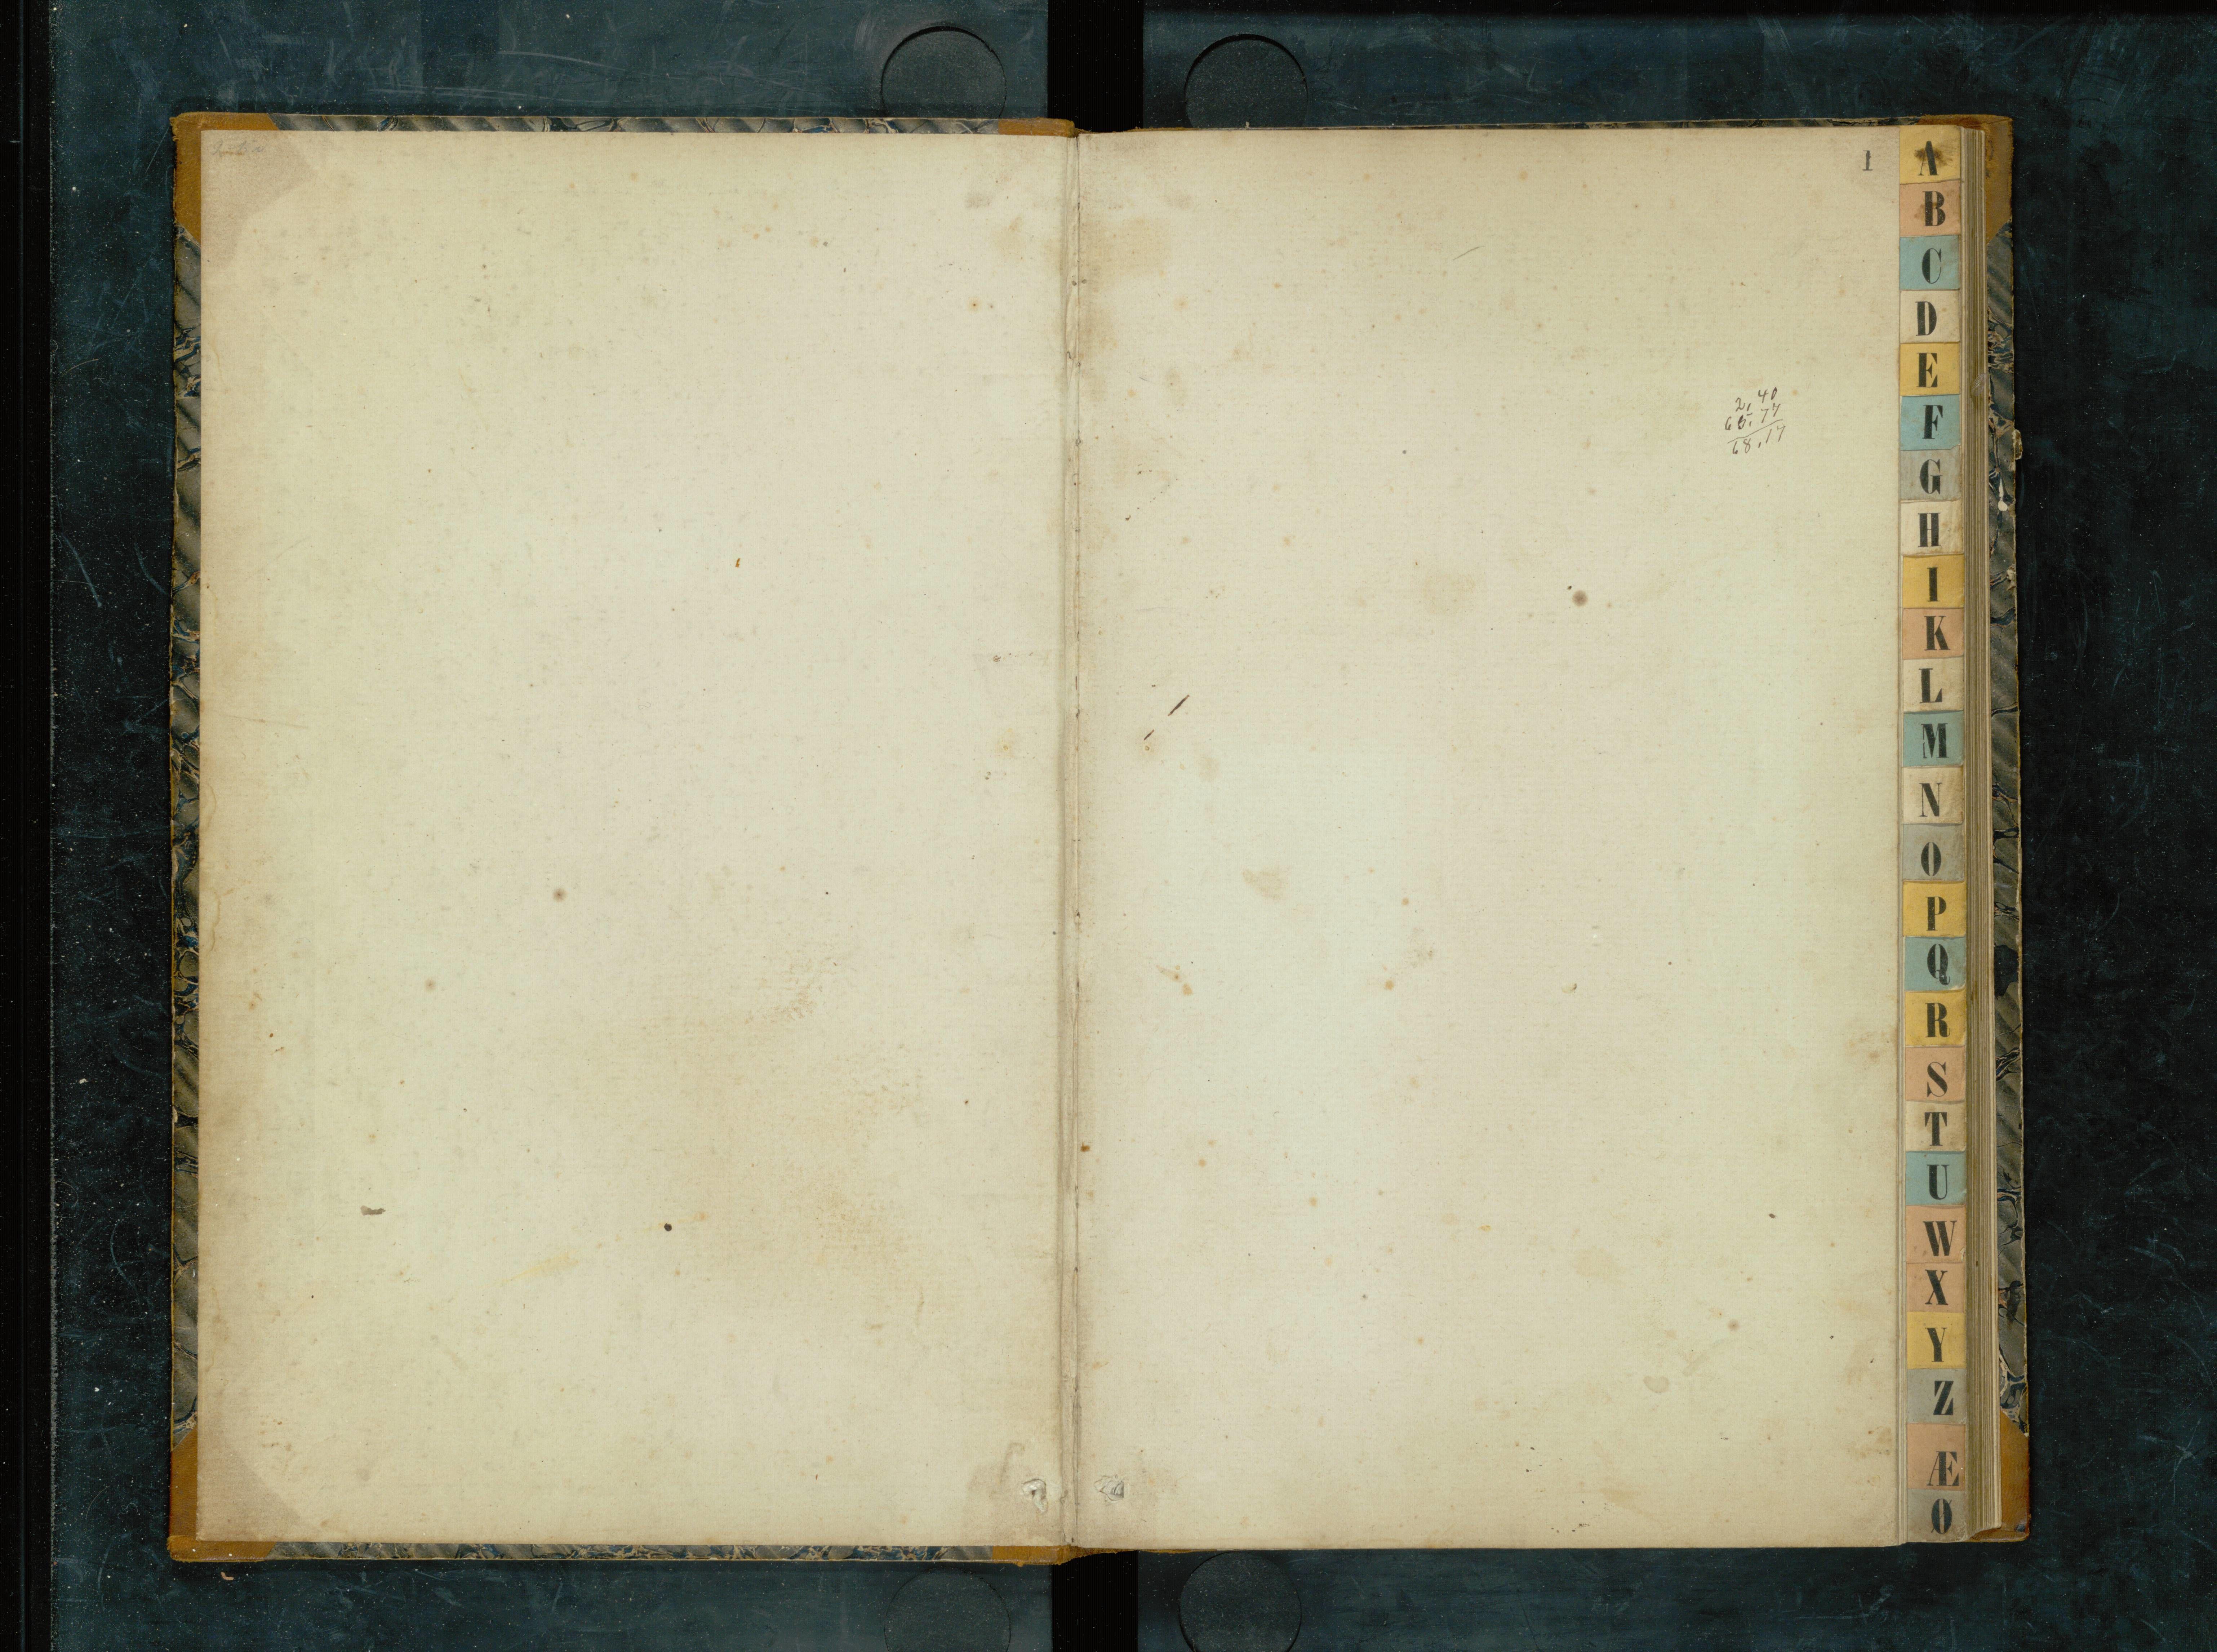 IKAH, Ulvik herad. Overformynderiet, F/Fb/L0001: Mindre overformyndarrulle, 1854-1911